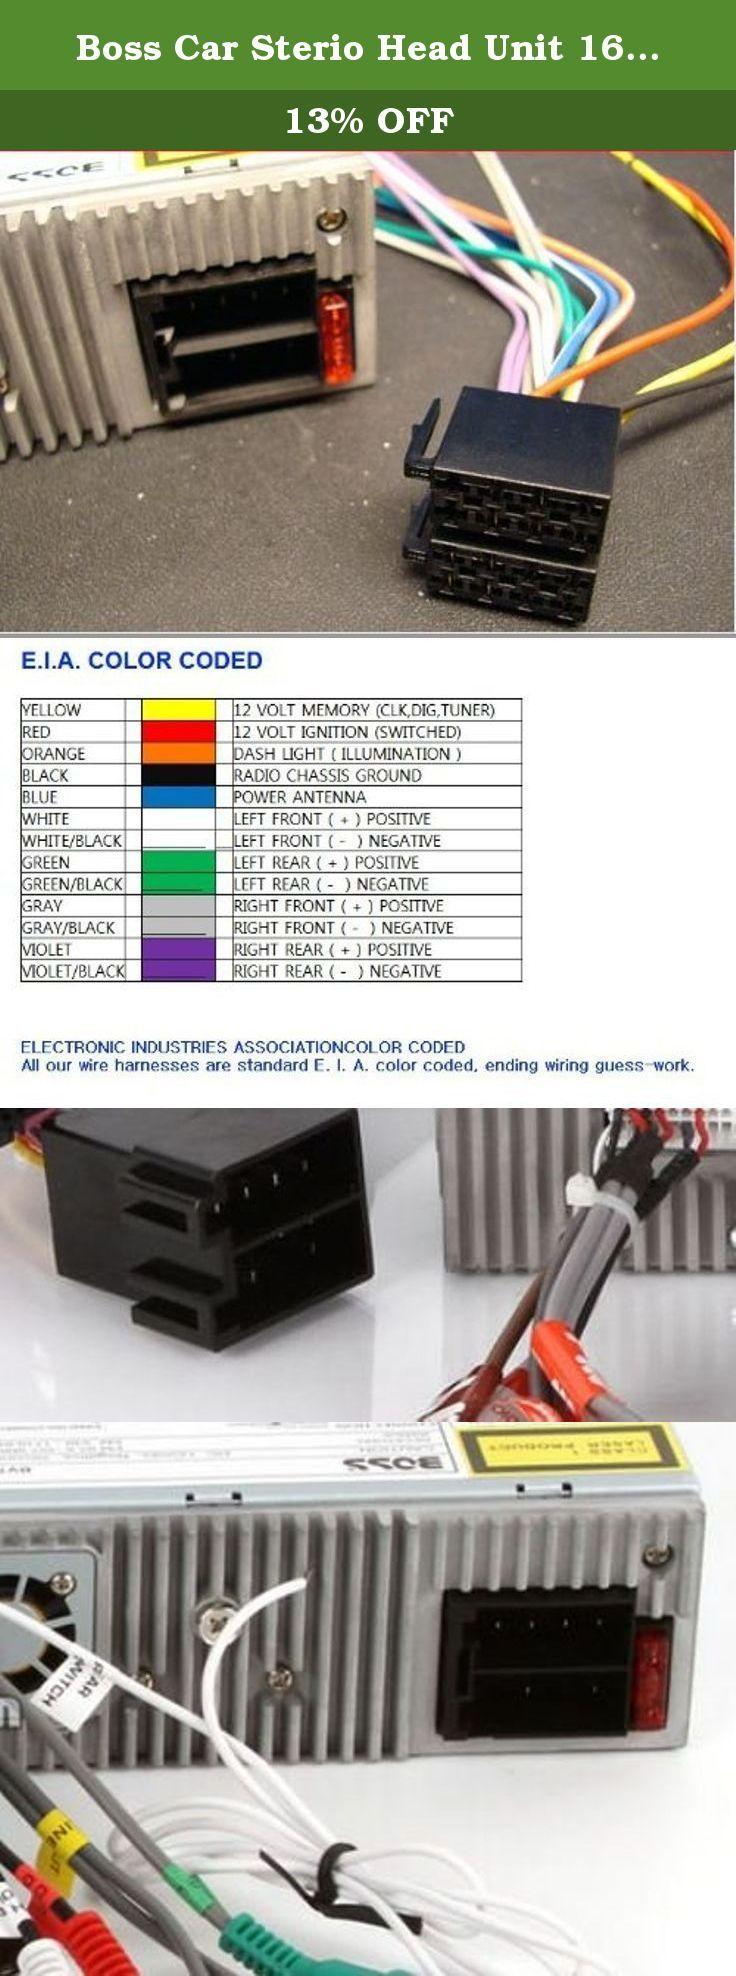 Boss Bv9980 Wiring Harness - Sg Epiphone Pro Wiring Diagram - fisher-wire .2010menanti.jeanjaures37.frWiring Diagram Resource